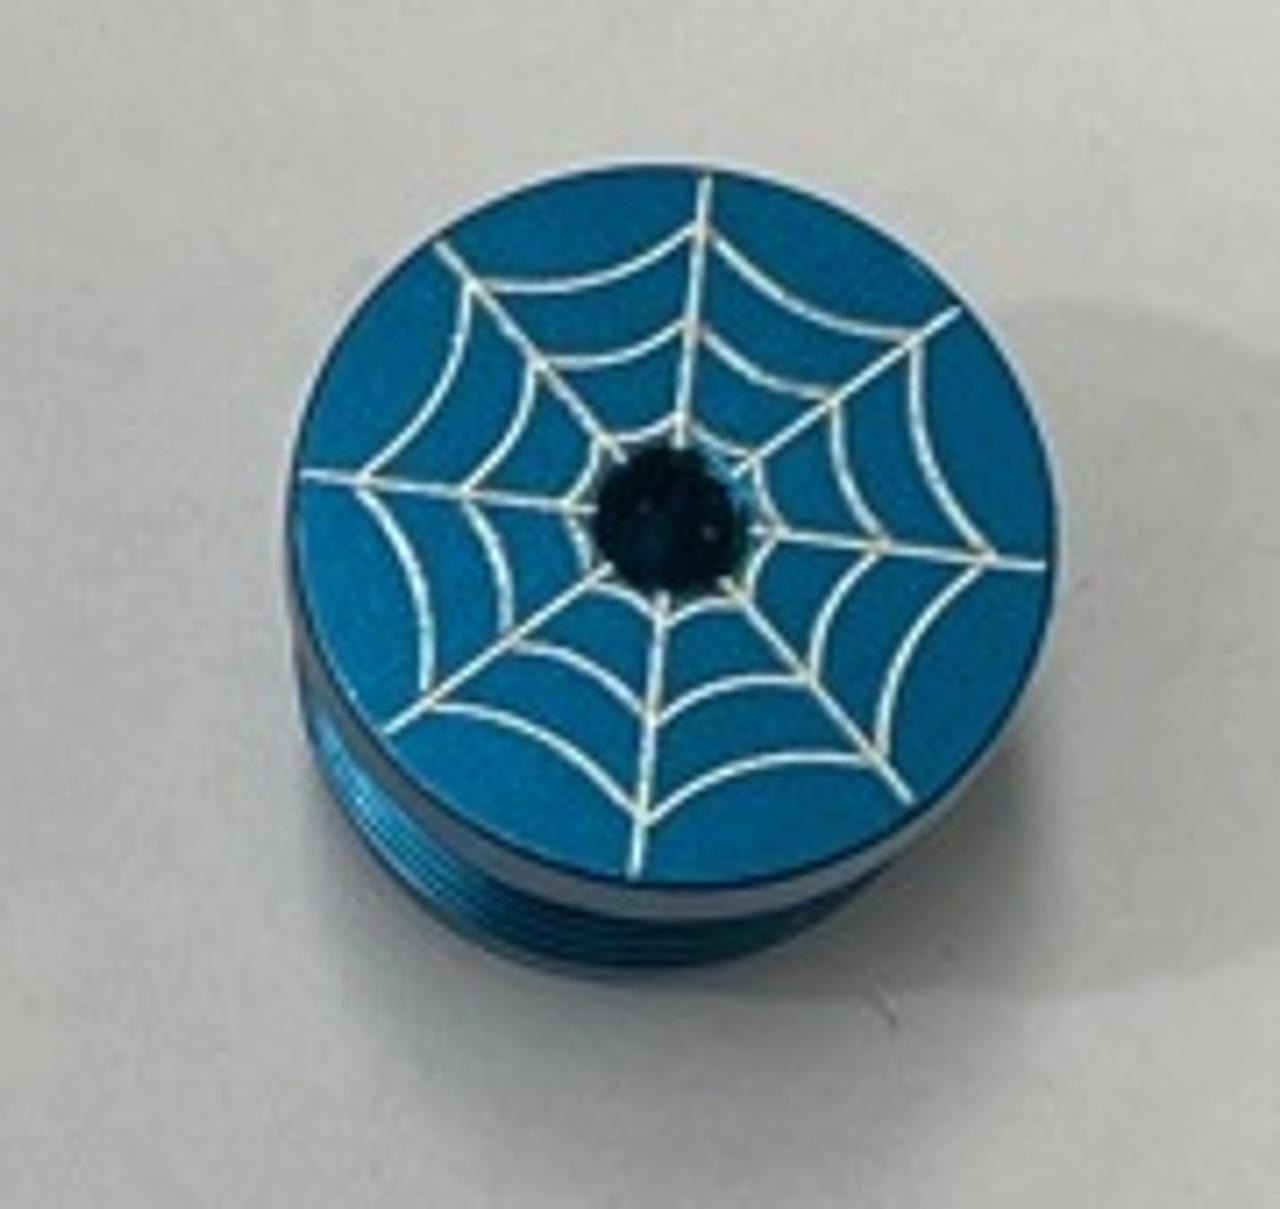 New Designz - Impulse - Hammer Cap - Web - Blue